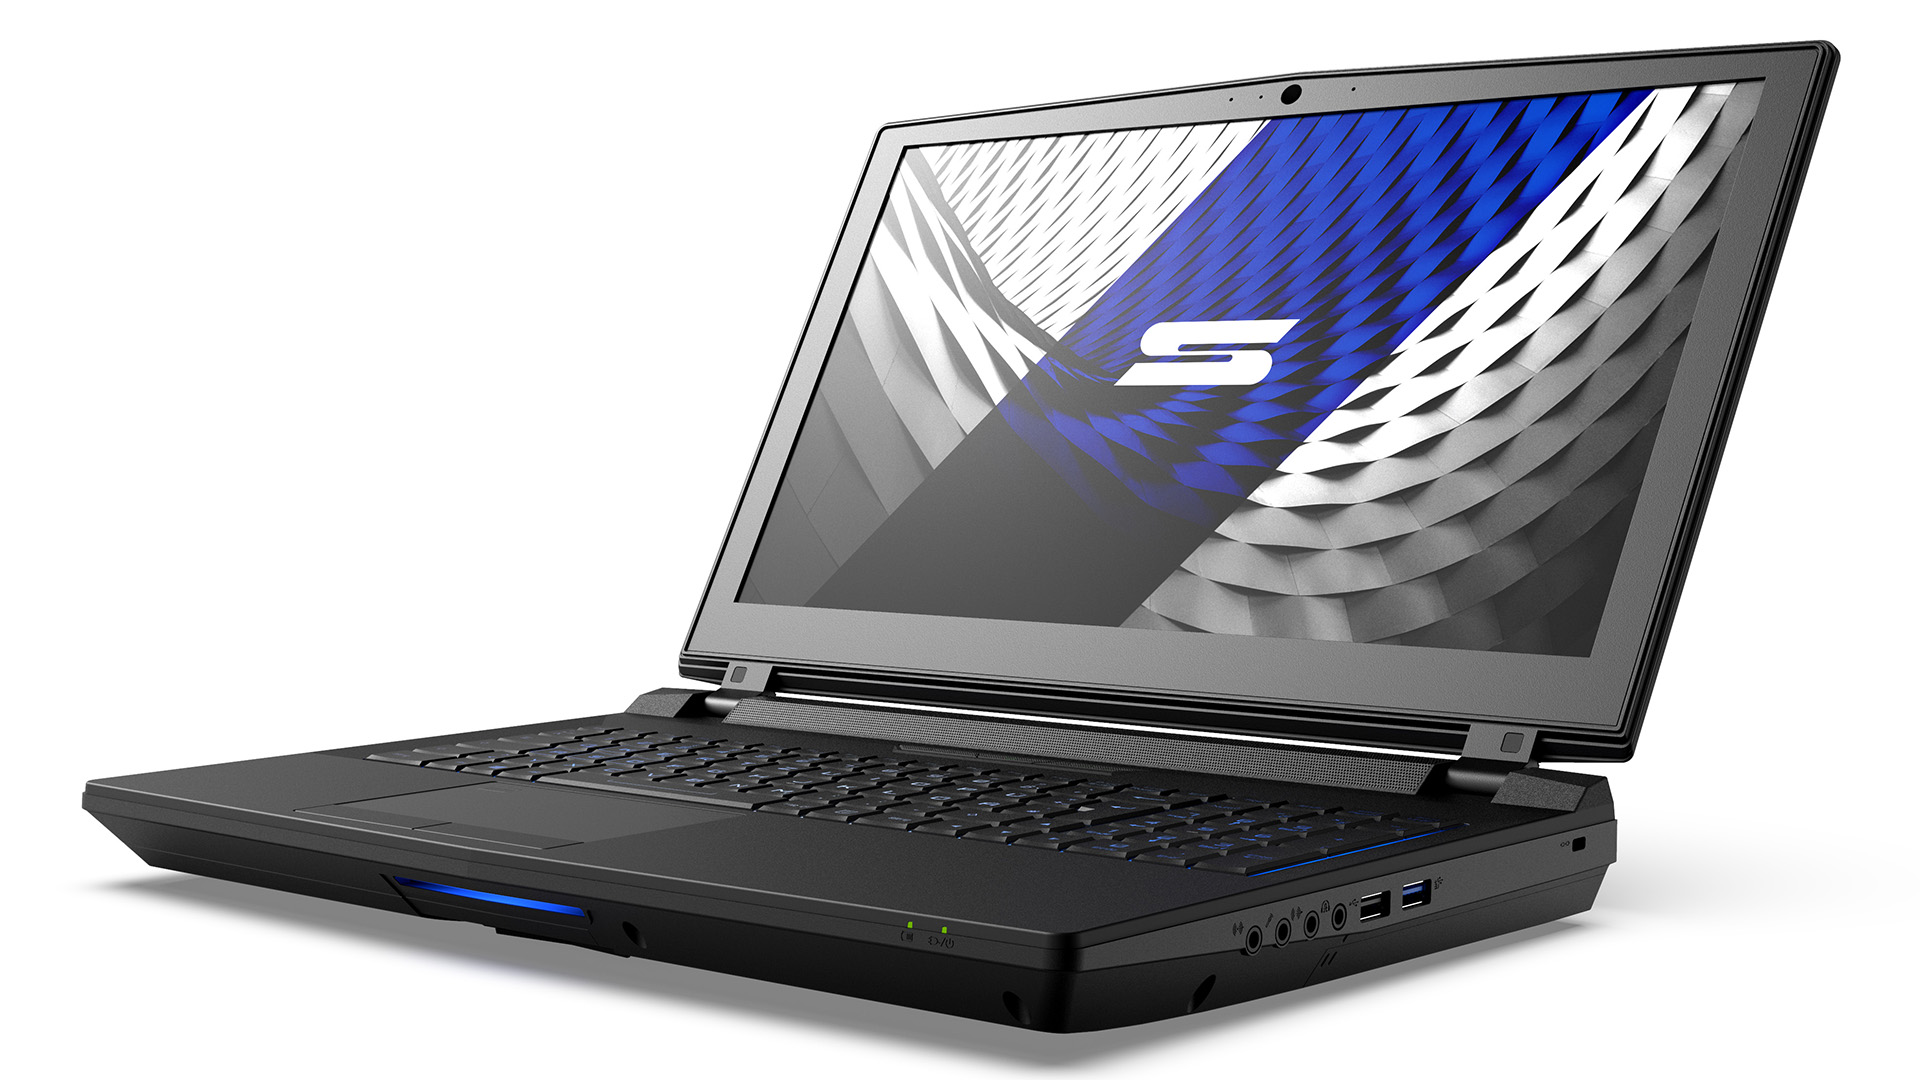 SCHENKER DTR-Serie: Kompromisslose Desktop-Replacement-Laptops mit NVIDIA RTX-Grafik